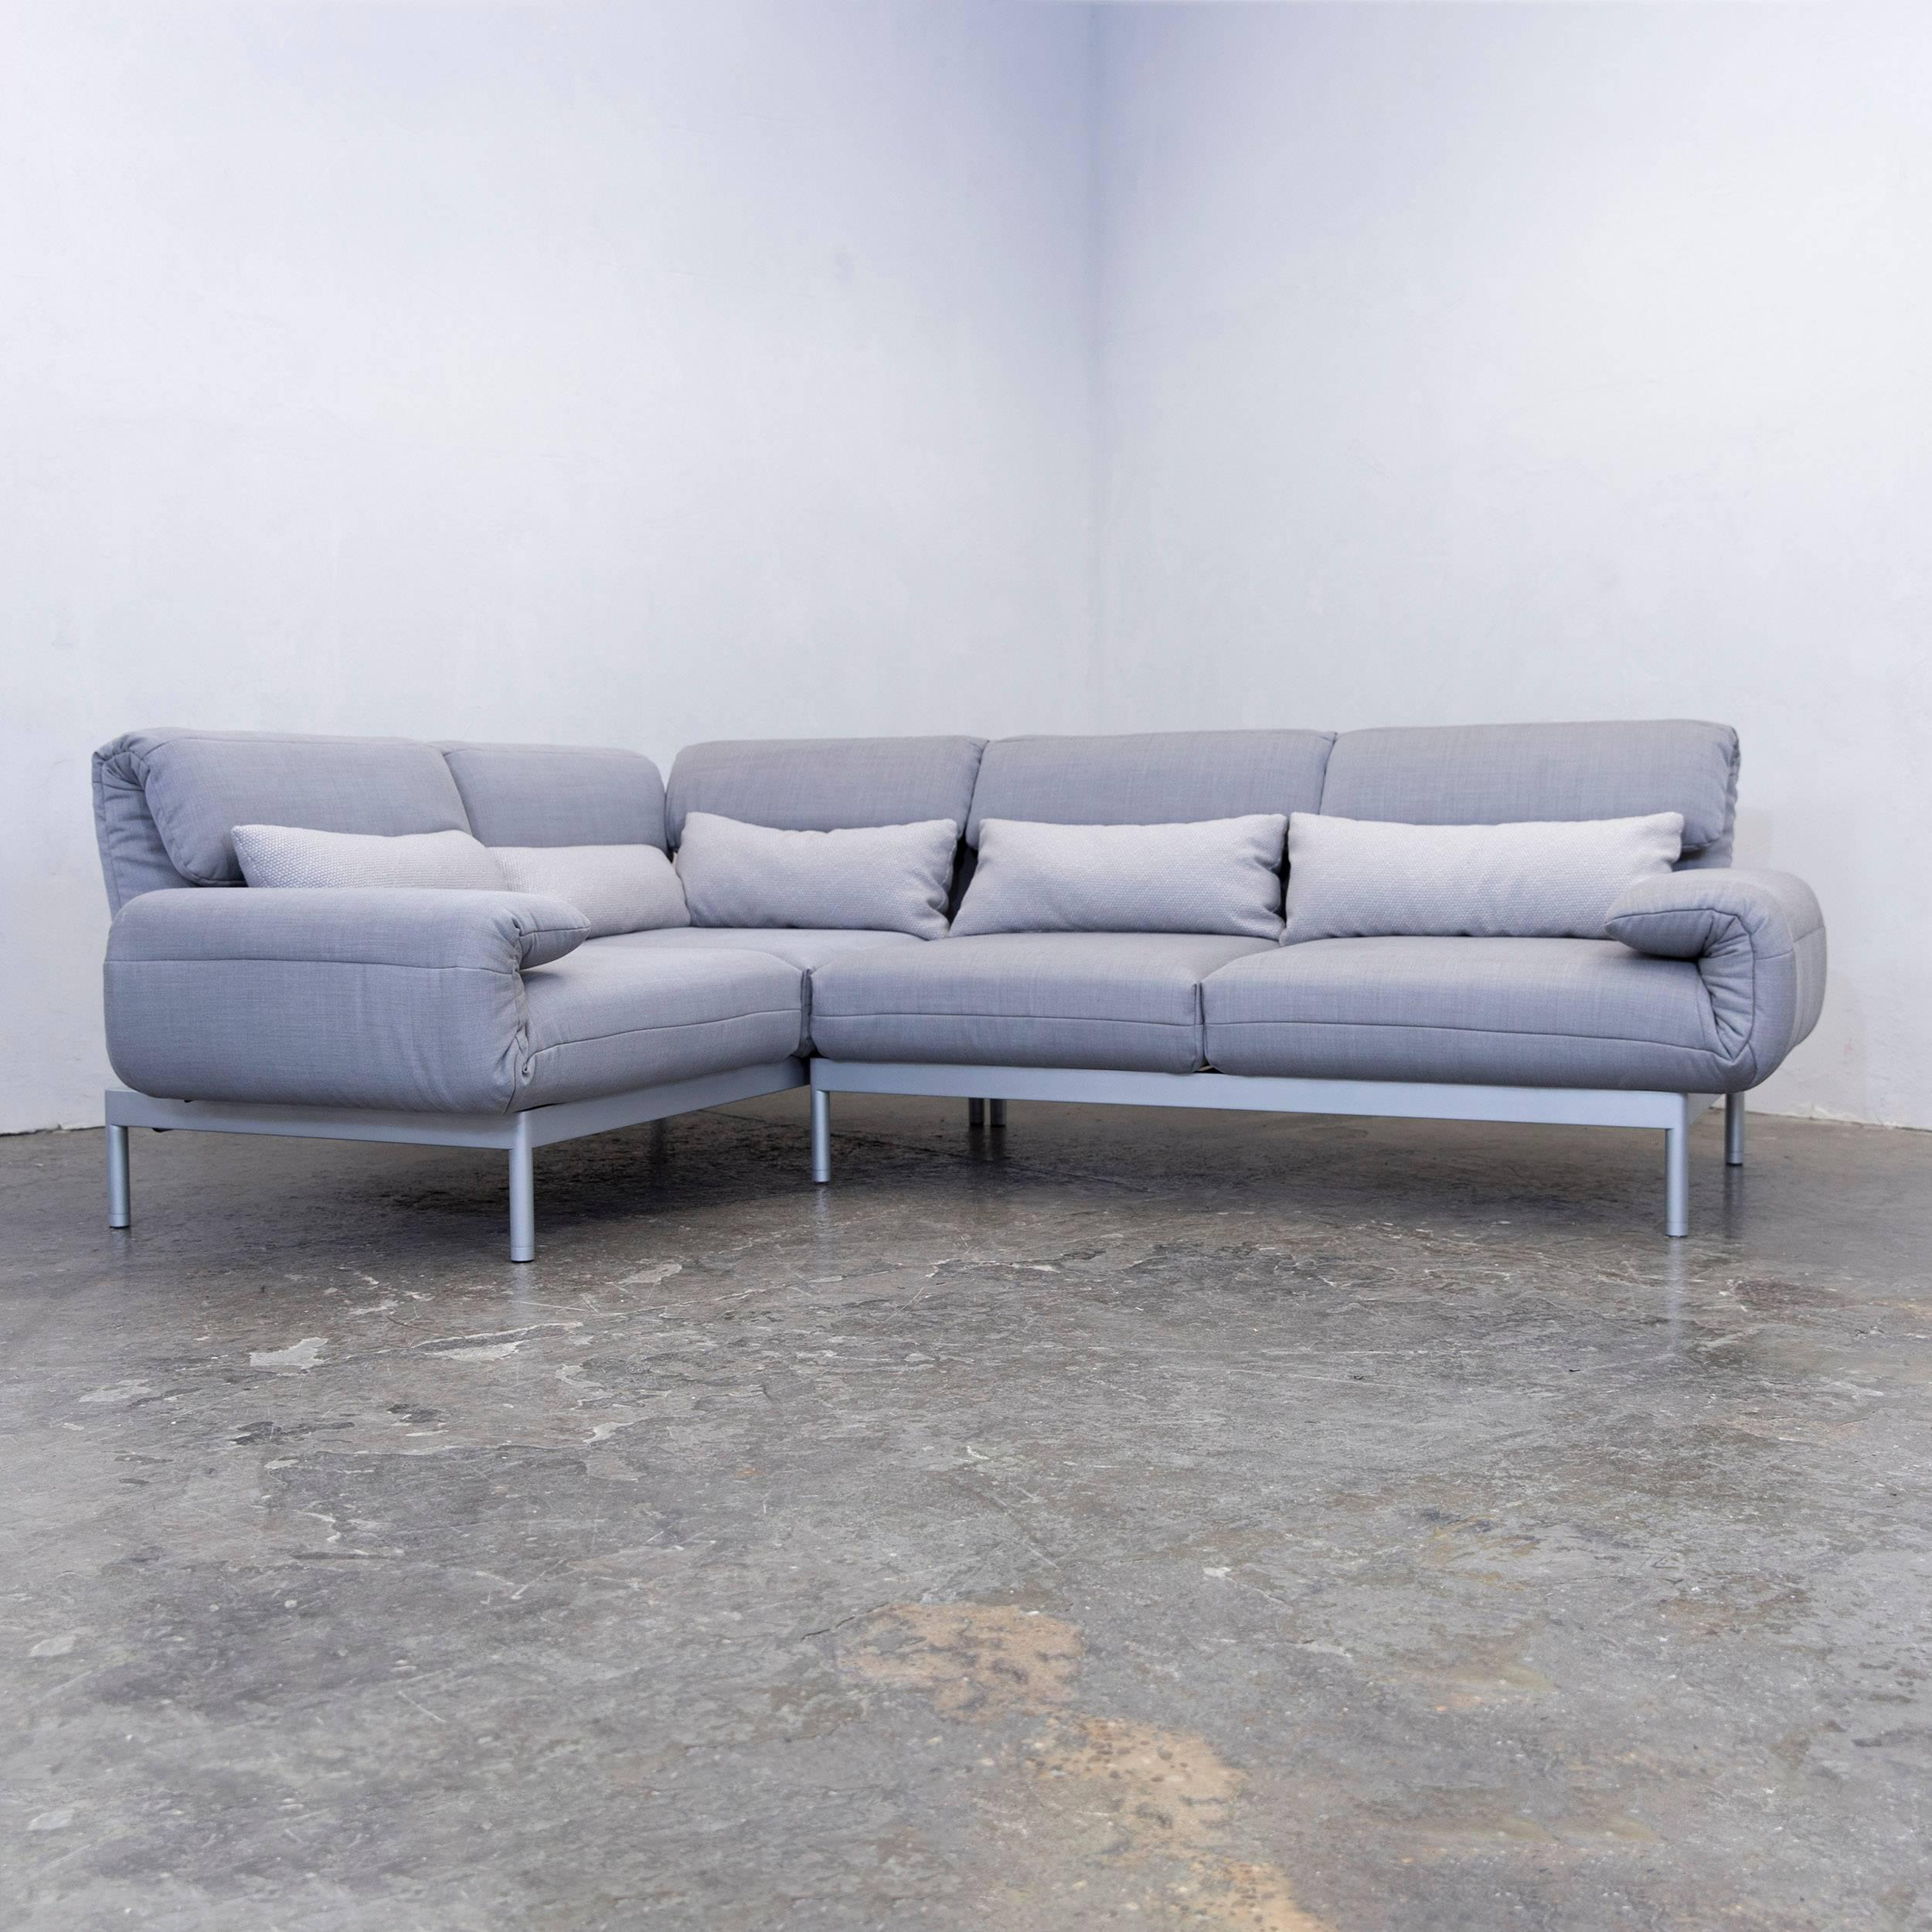 Sofa Struktur. Bright Design Riess Ambiente Sofa Ecksofa Mit Hocker ...